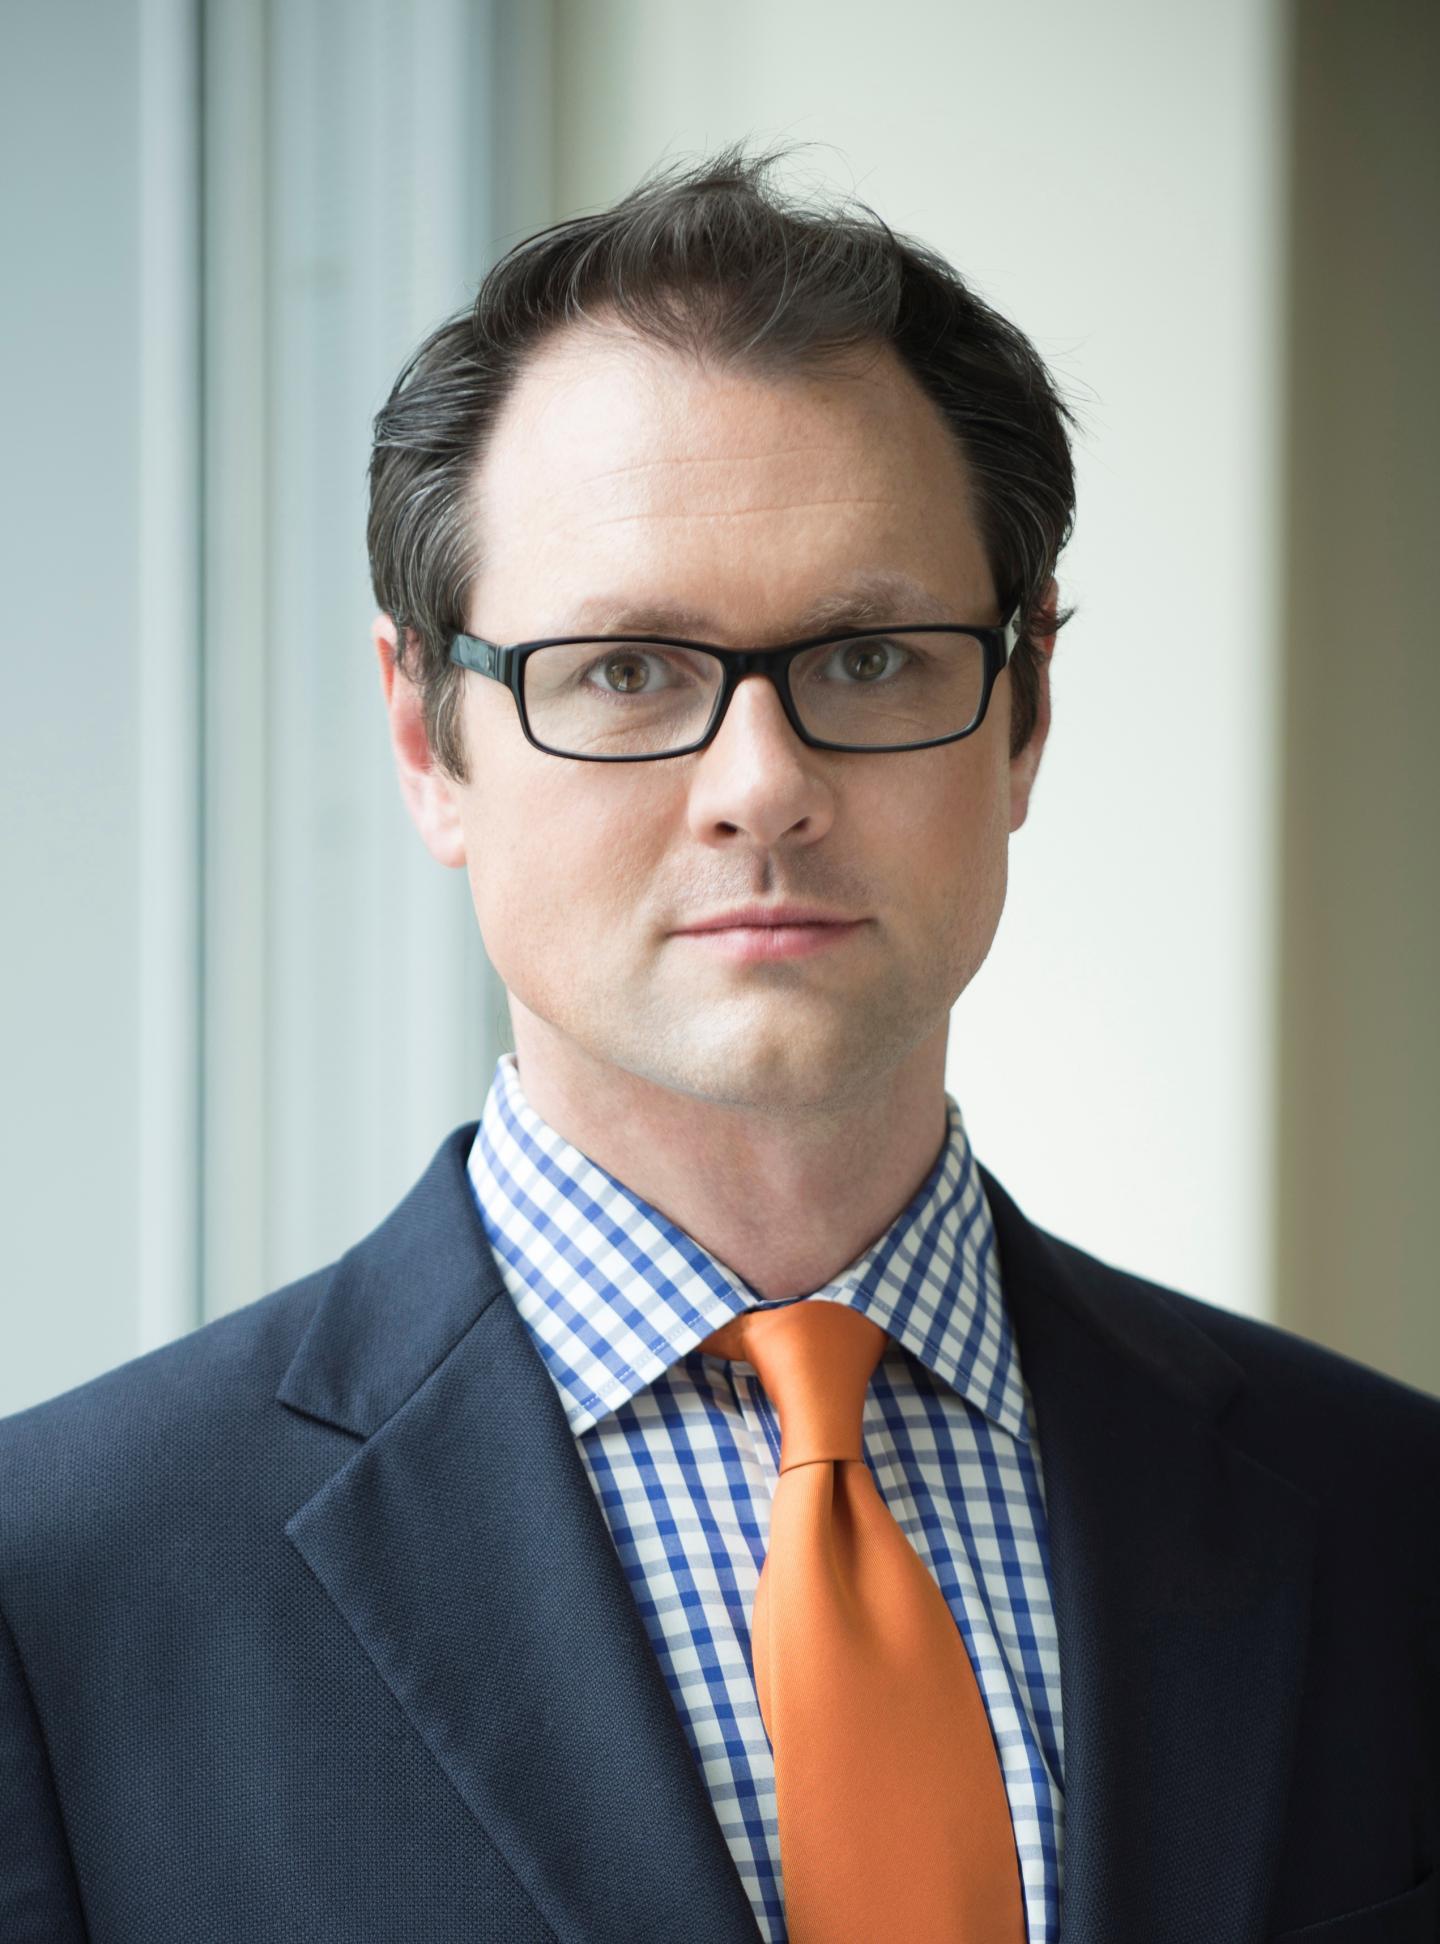 James MacKillop, McMaster University